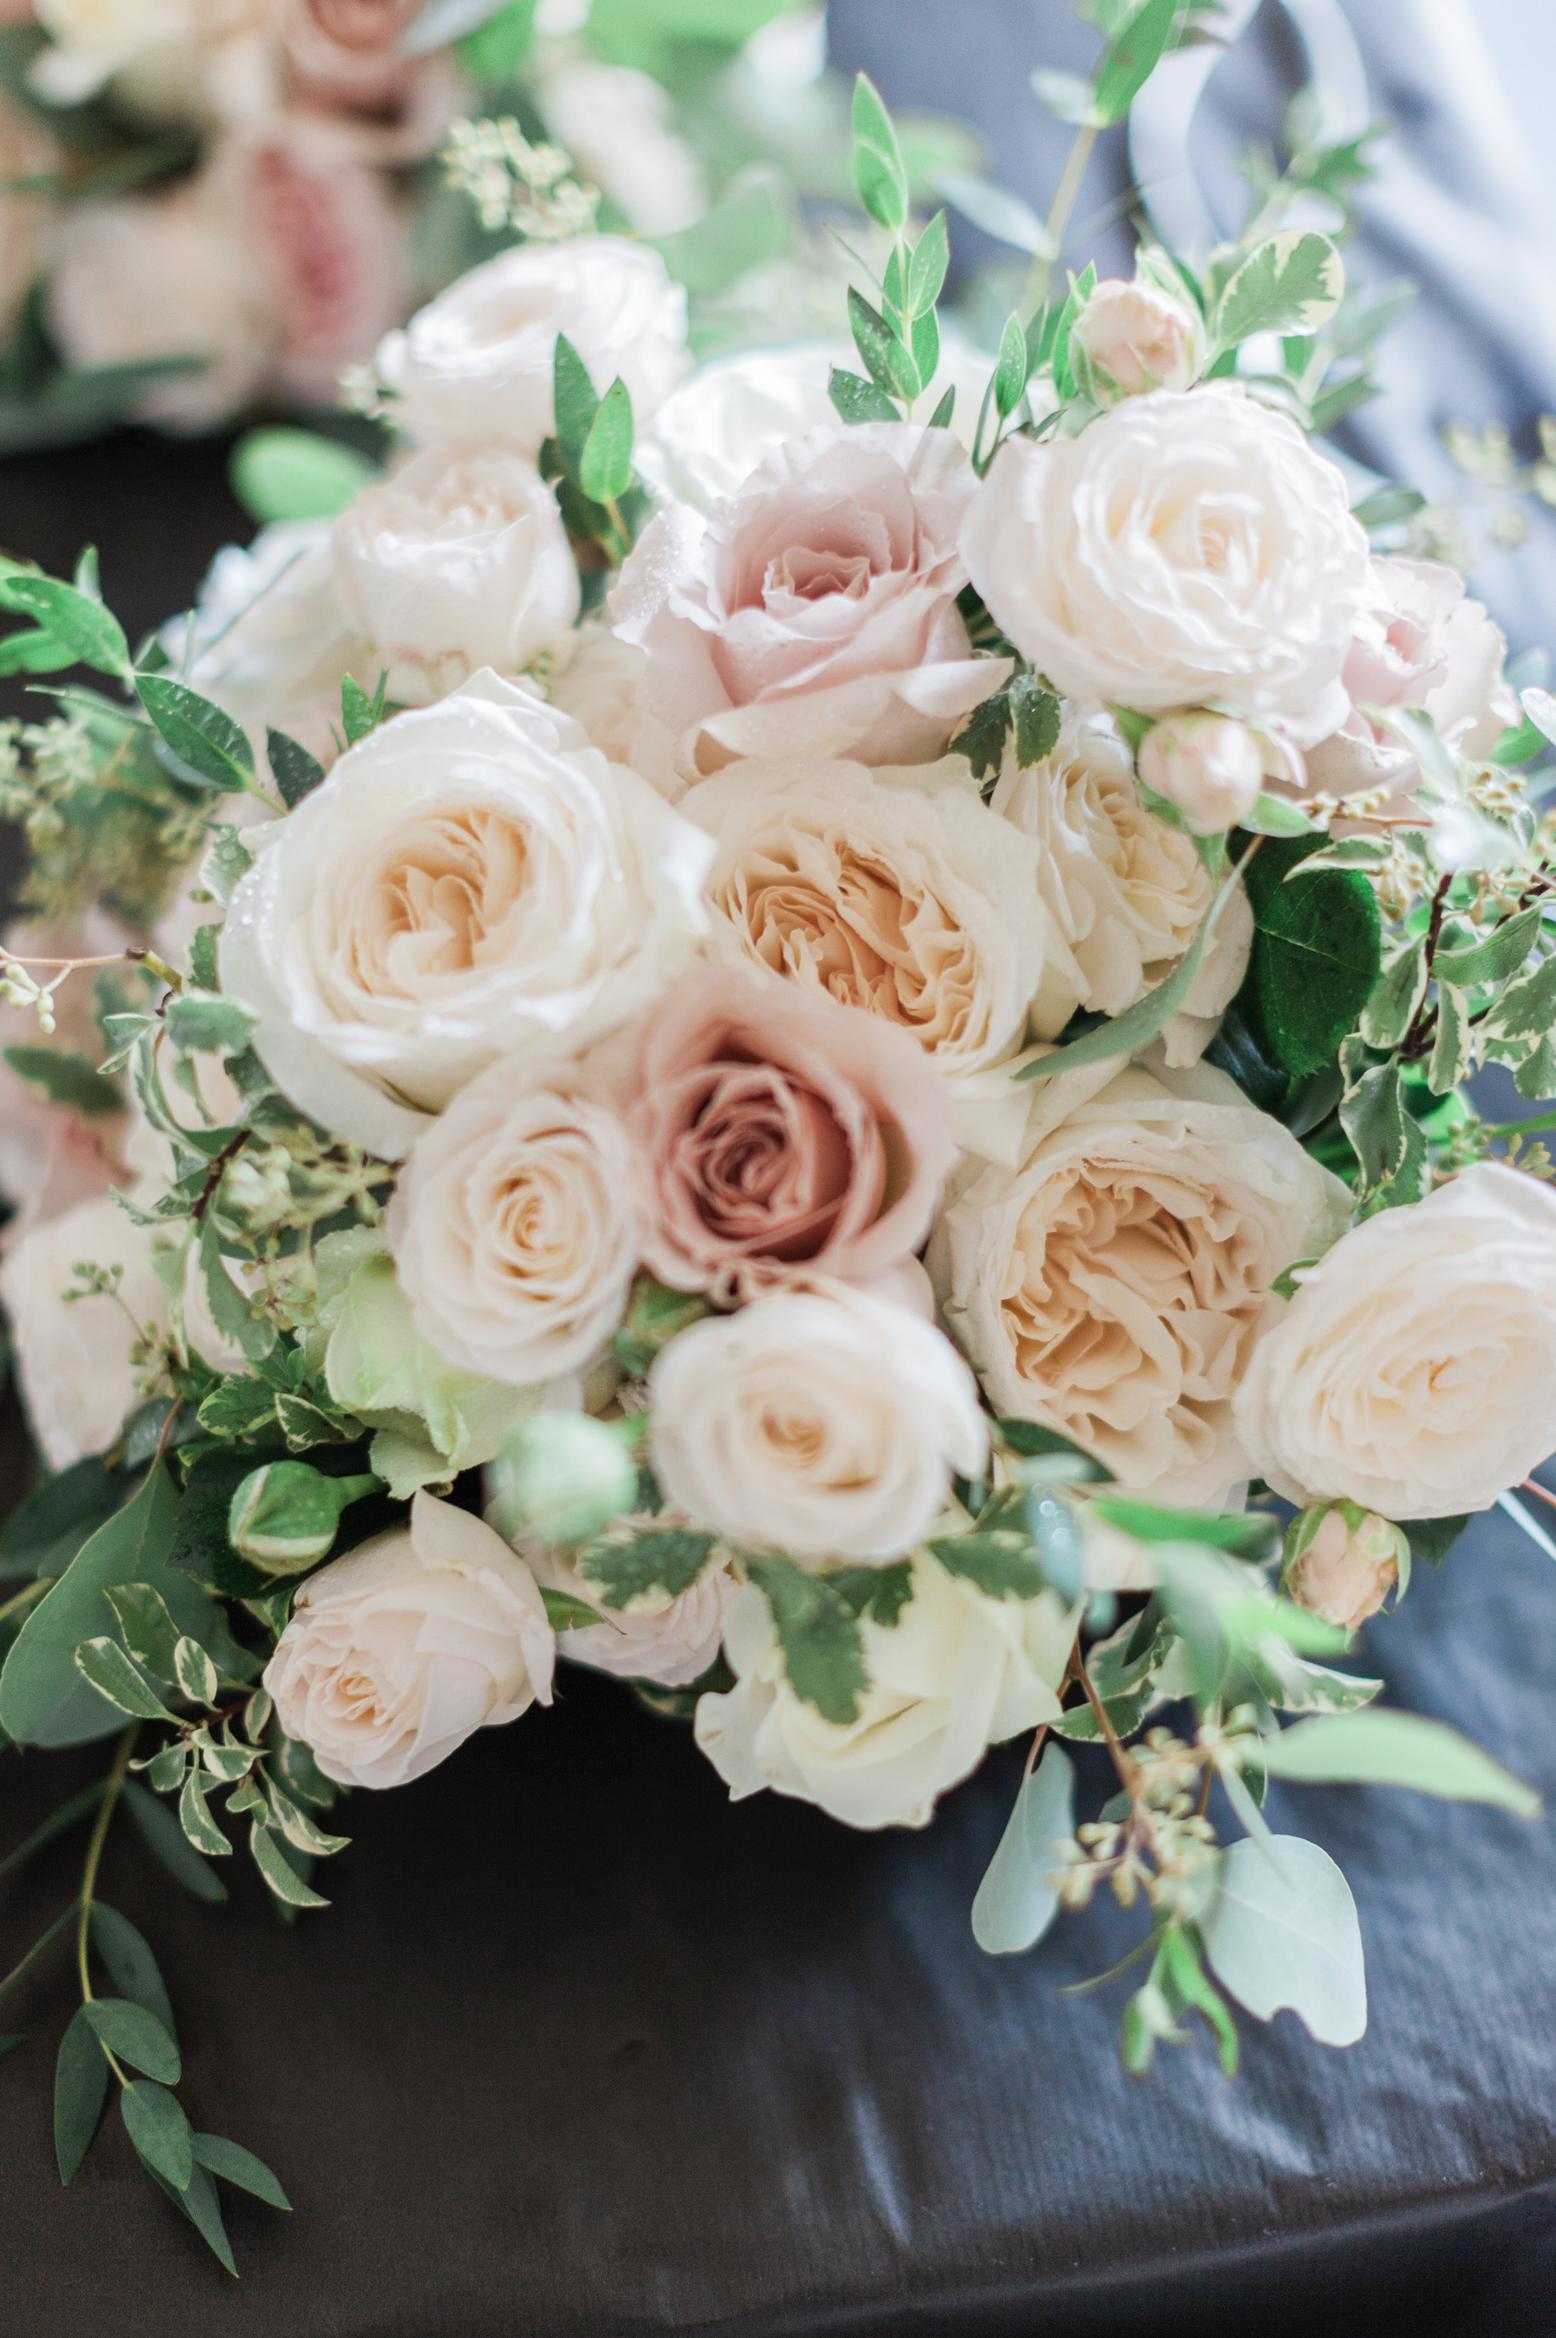 English Country Garden Bridal Bouquet Wedding Bouquets Pink Garden Rose Bouquet Wedding Flower Bouquet Wedding